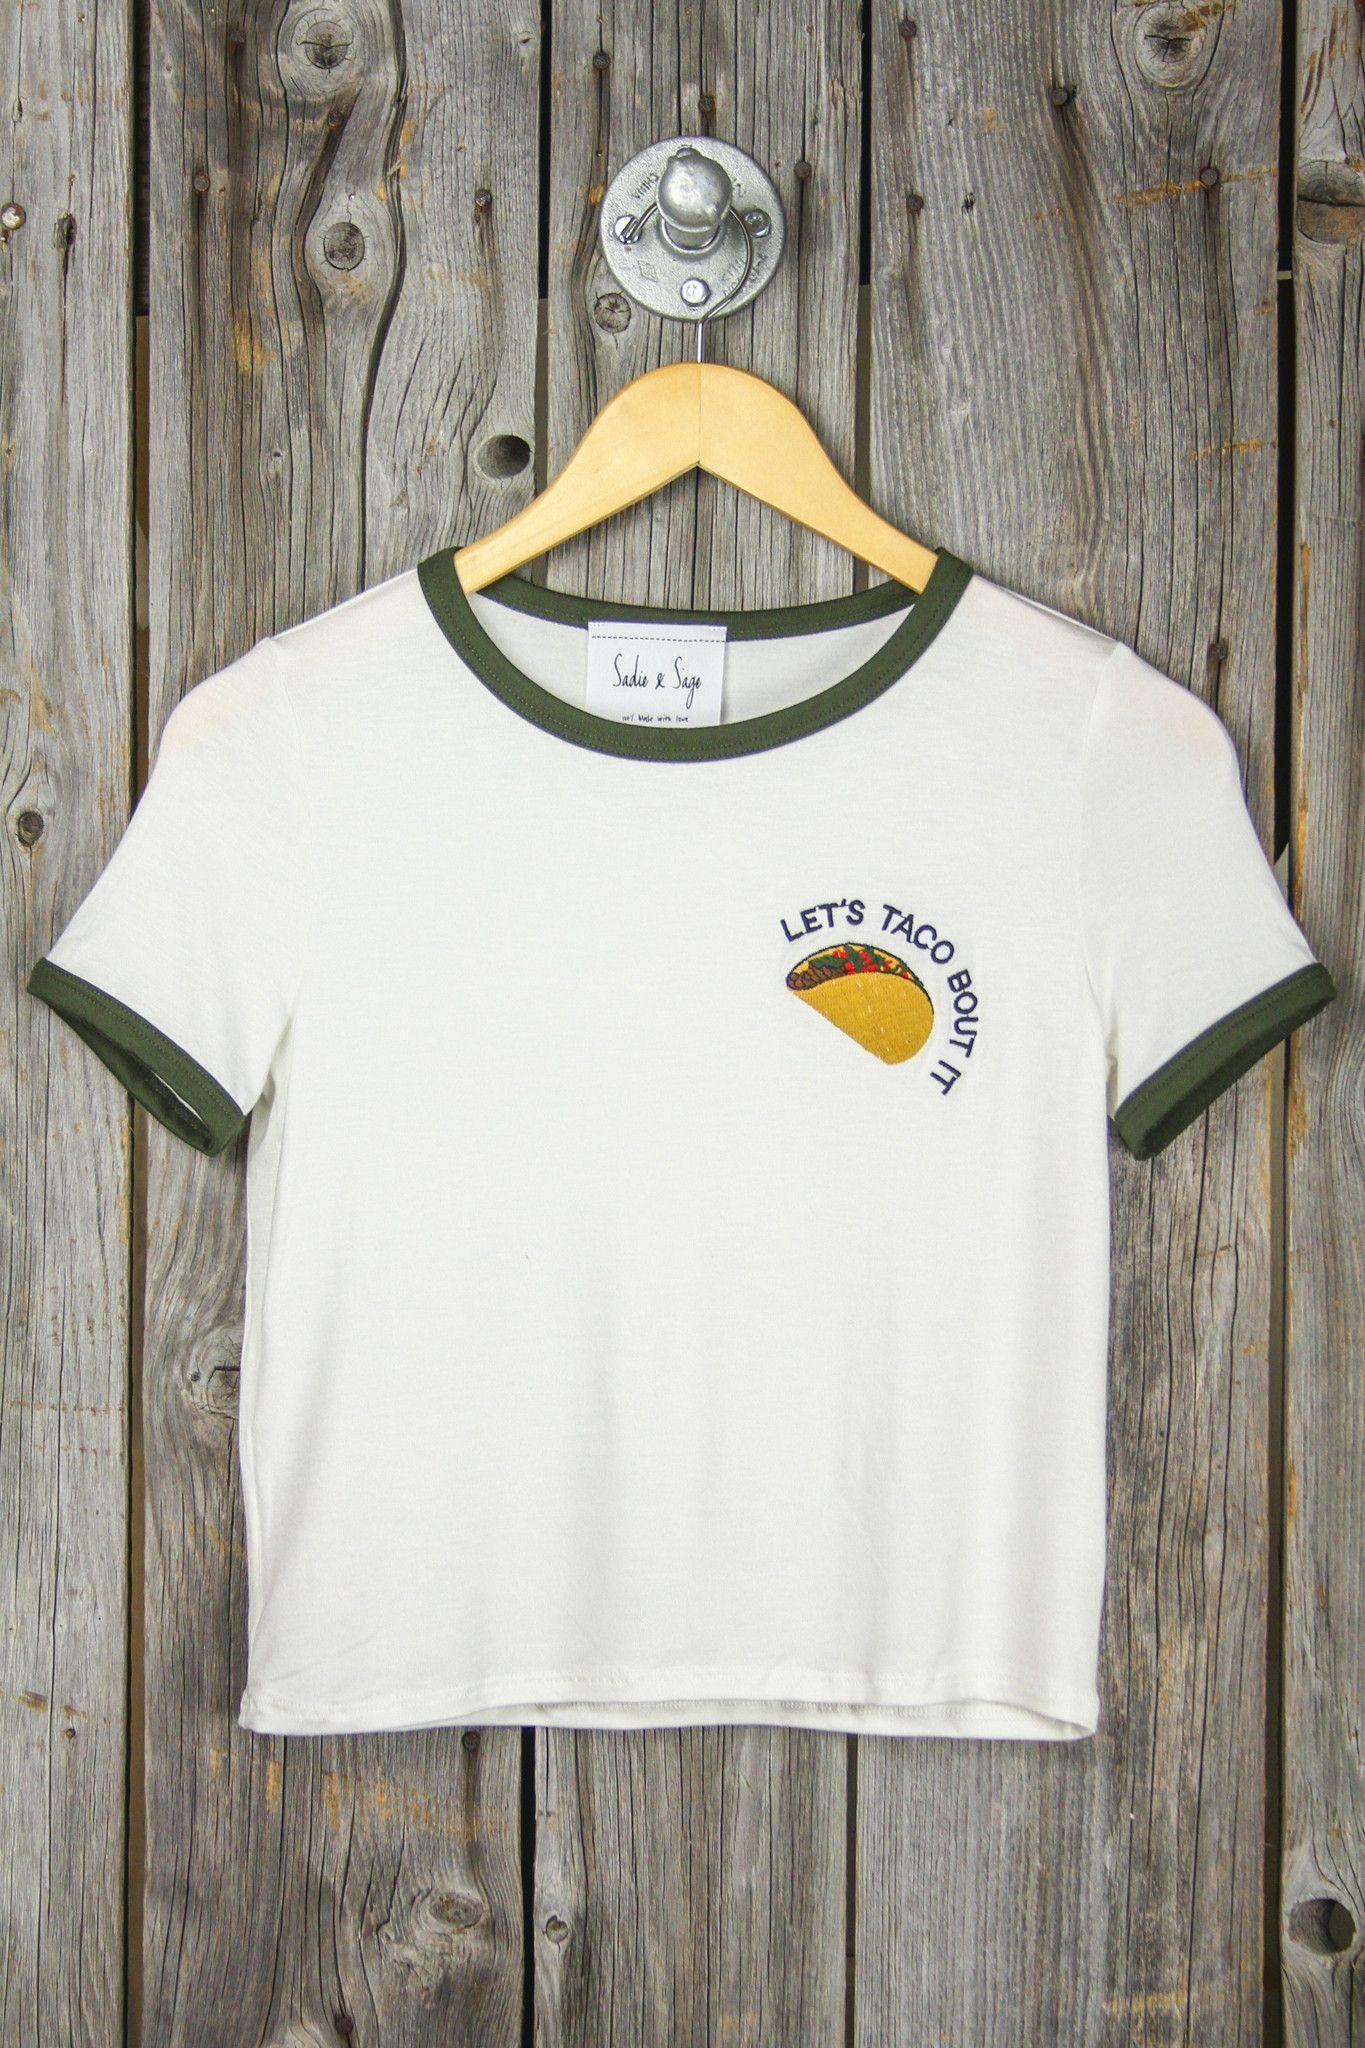 Lets Taco Bout It Ringer Tee Sugarcloth Tees Shirts Heart Printed Circuit Board Tshirts Unisex Triblend Tshirt